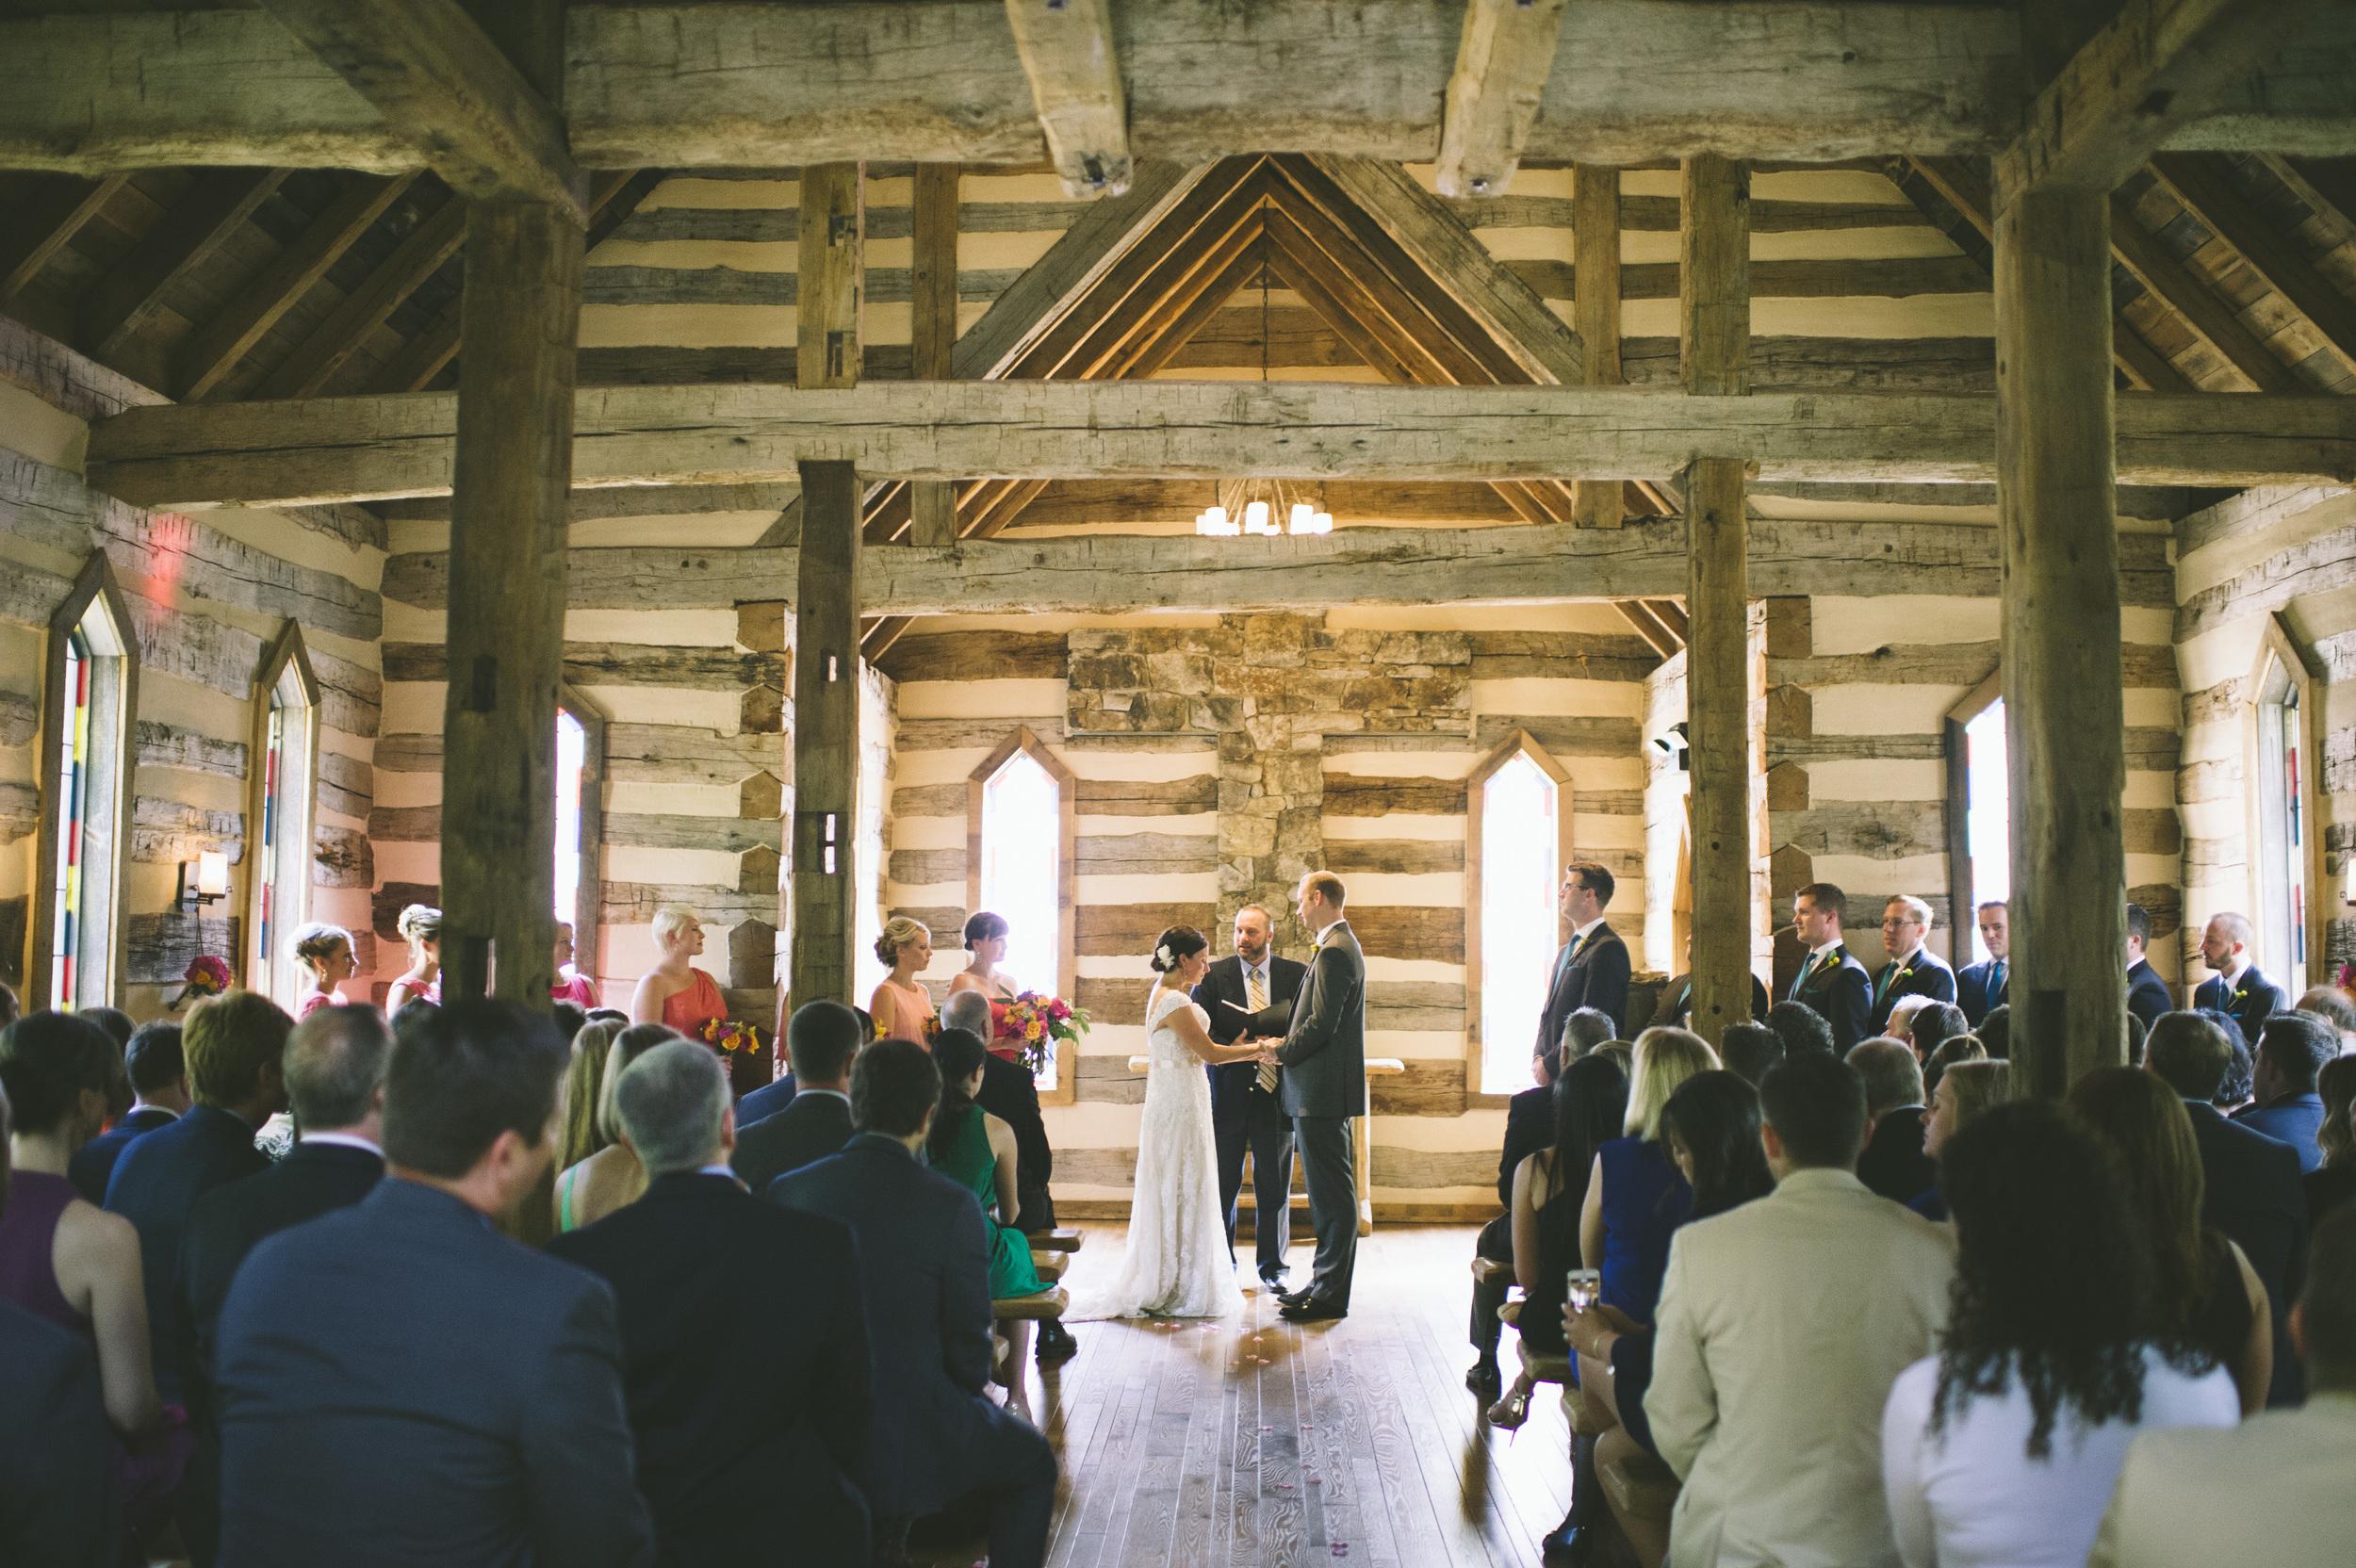 The Oak Lodge PA